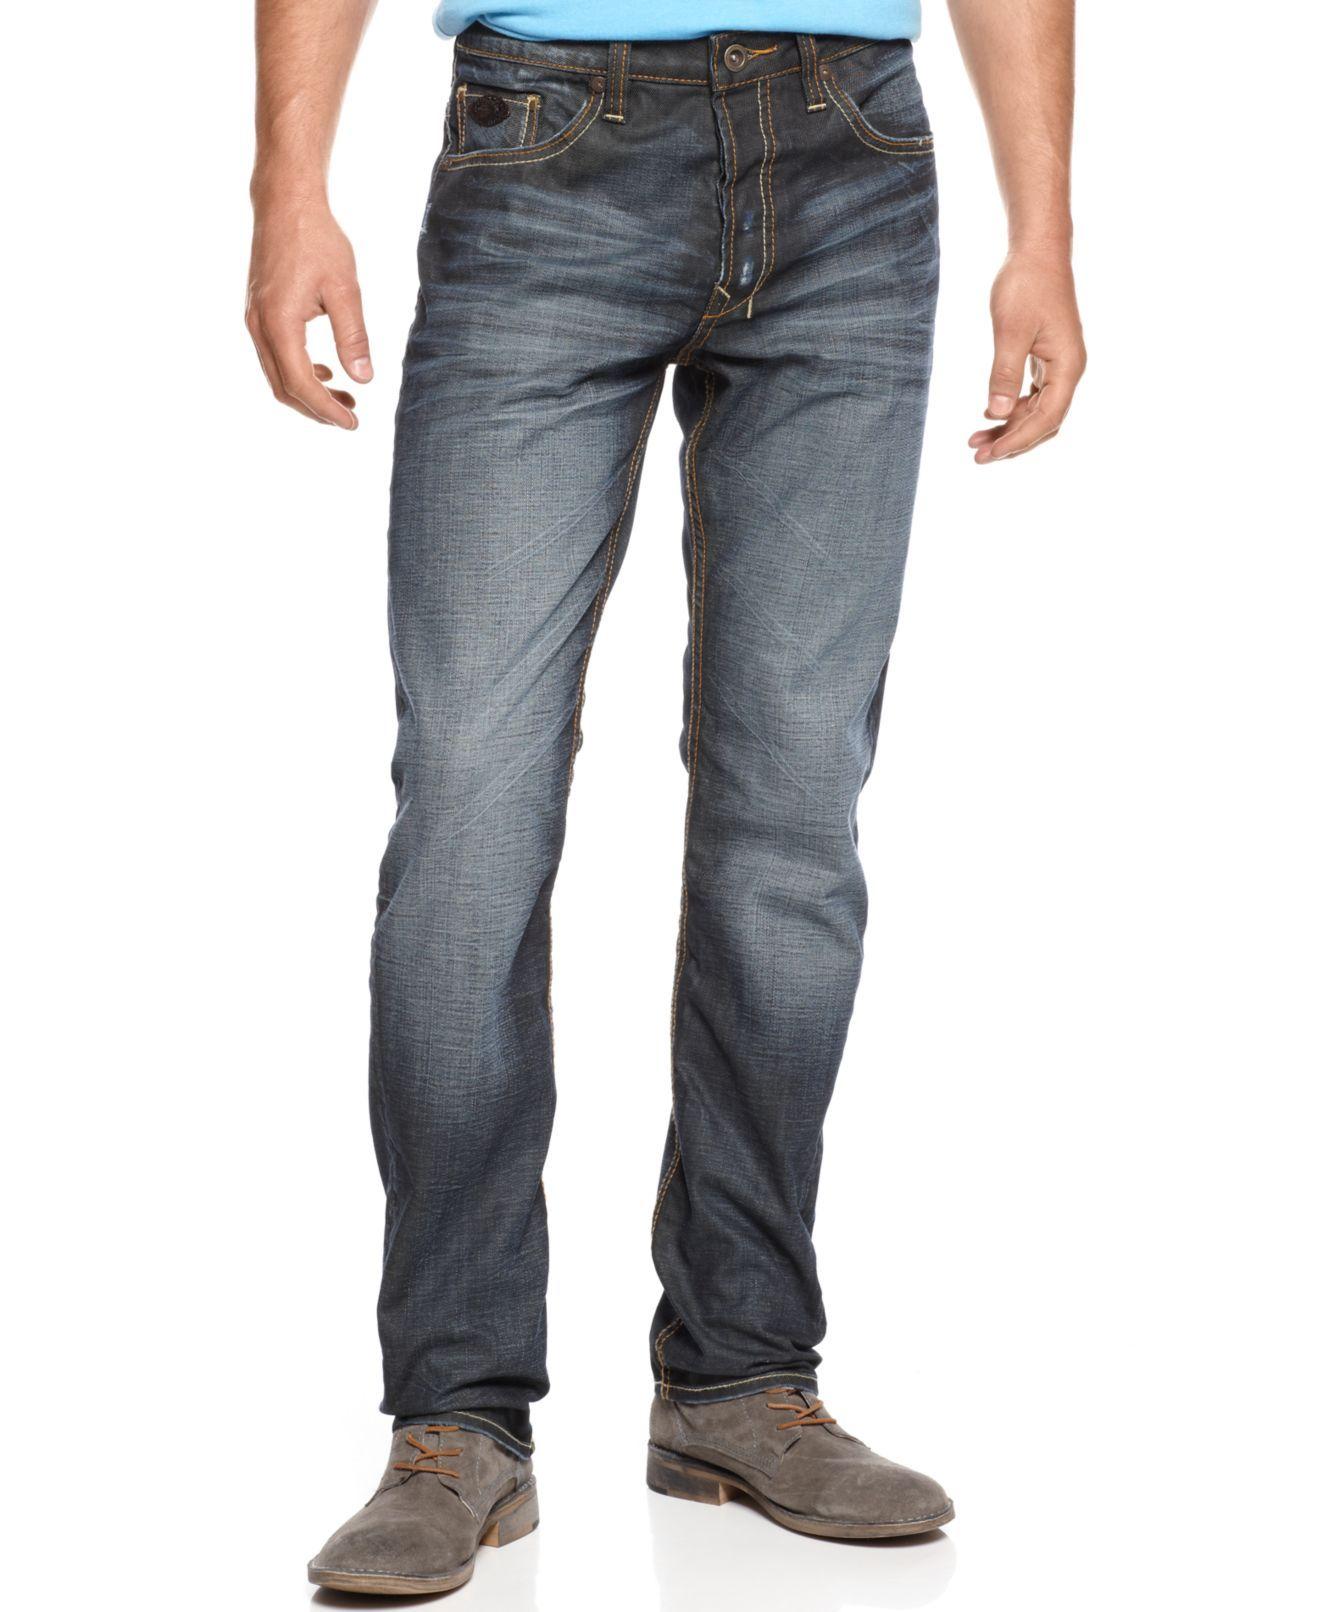 06d4d00d Buffalo David Bitton Jeans, Evan Super Slim Fit - Mens Young Men's - Macy's